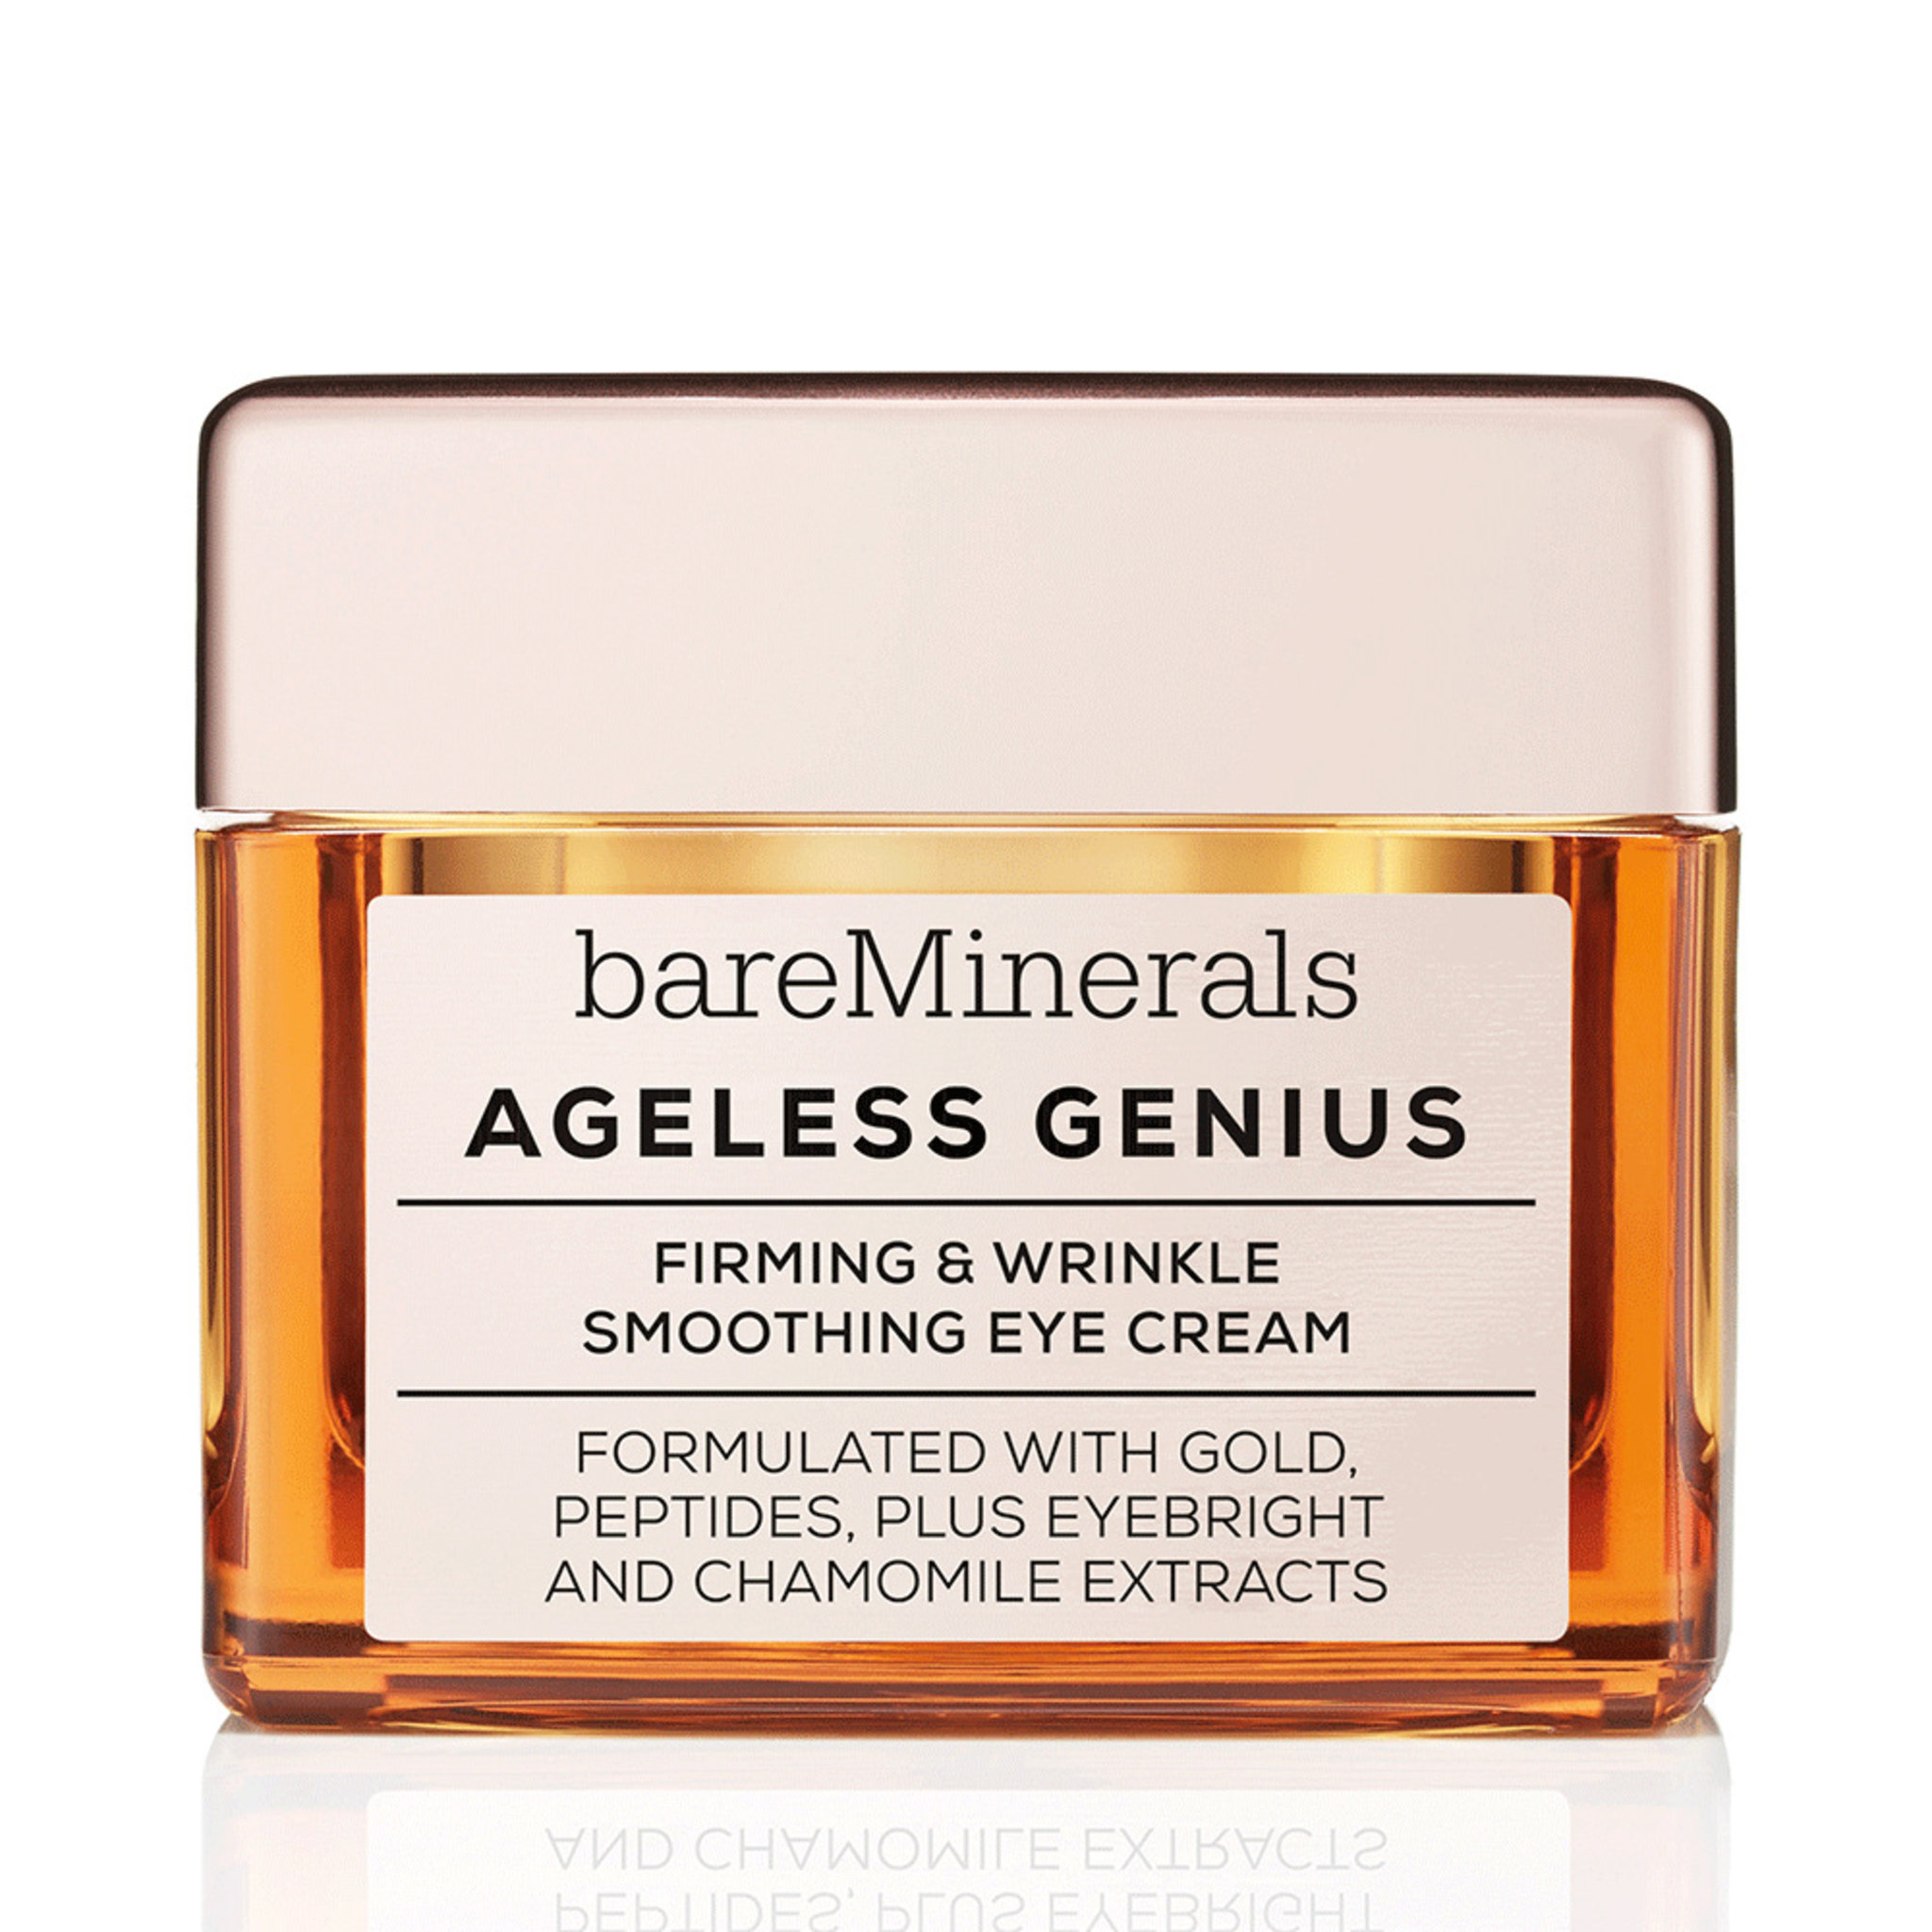 Ageless Genius™ Firming & Wrinkle Smoothing Eye Cream 15g